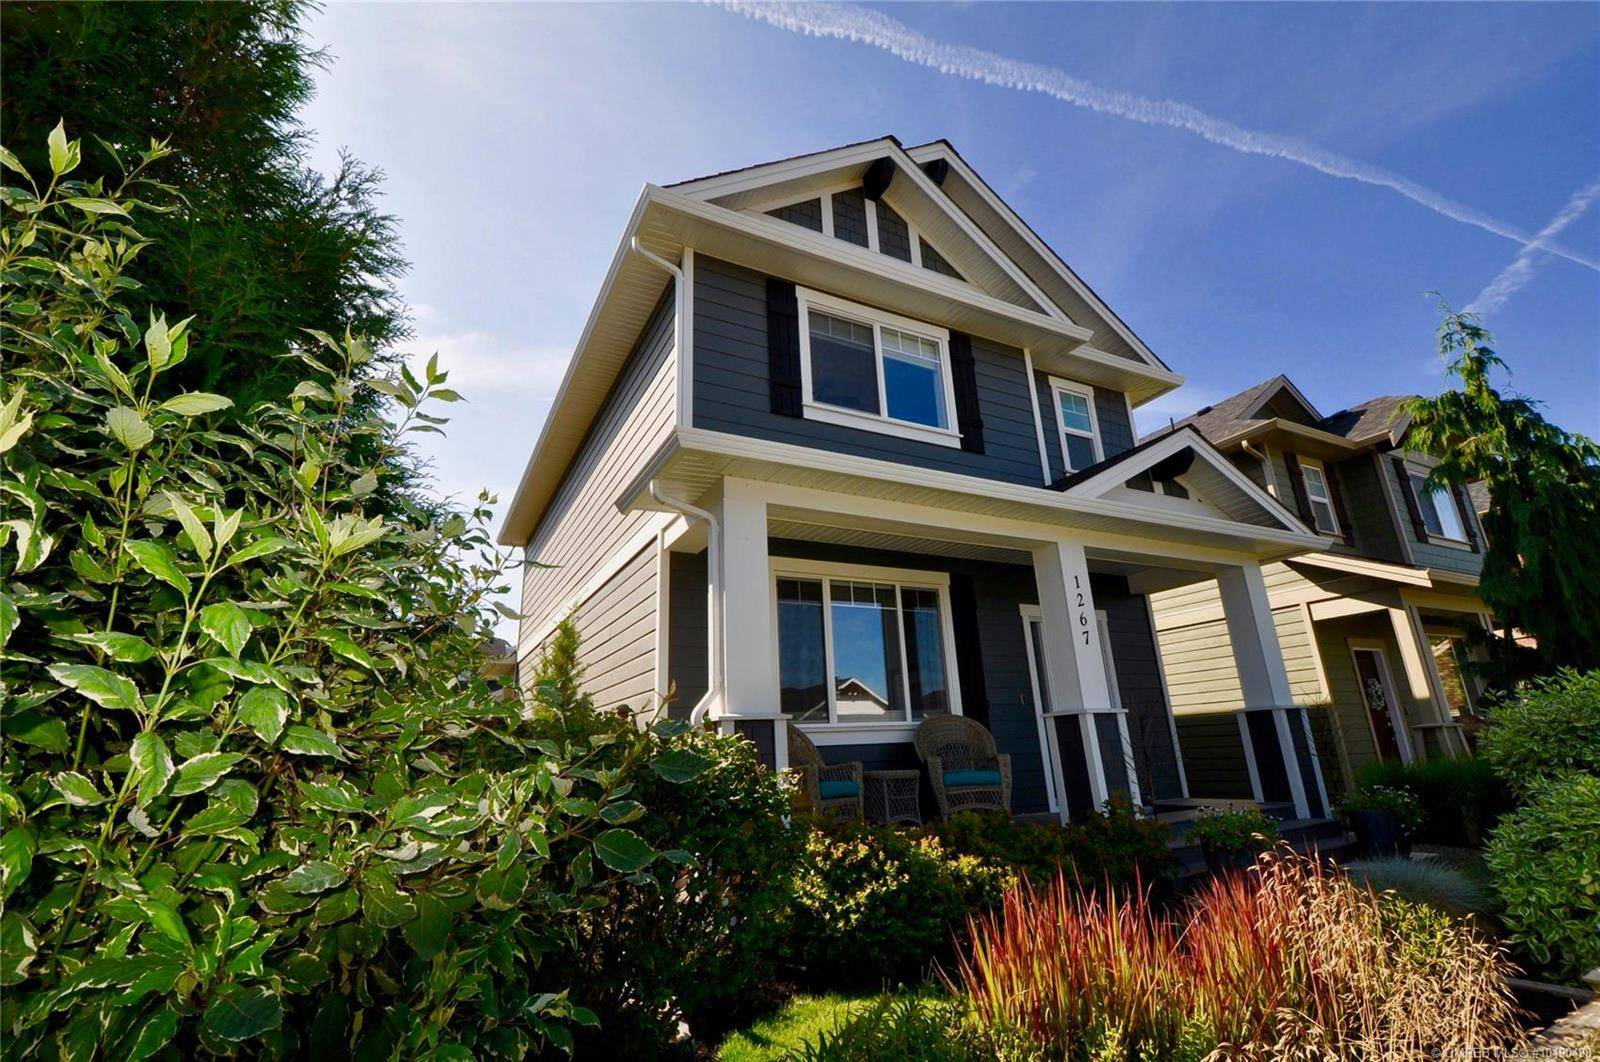 House for sale at 1267 Steele Rd Kelowna British Columbia - MLS: 10190498